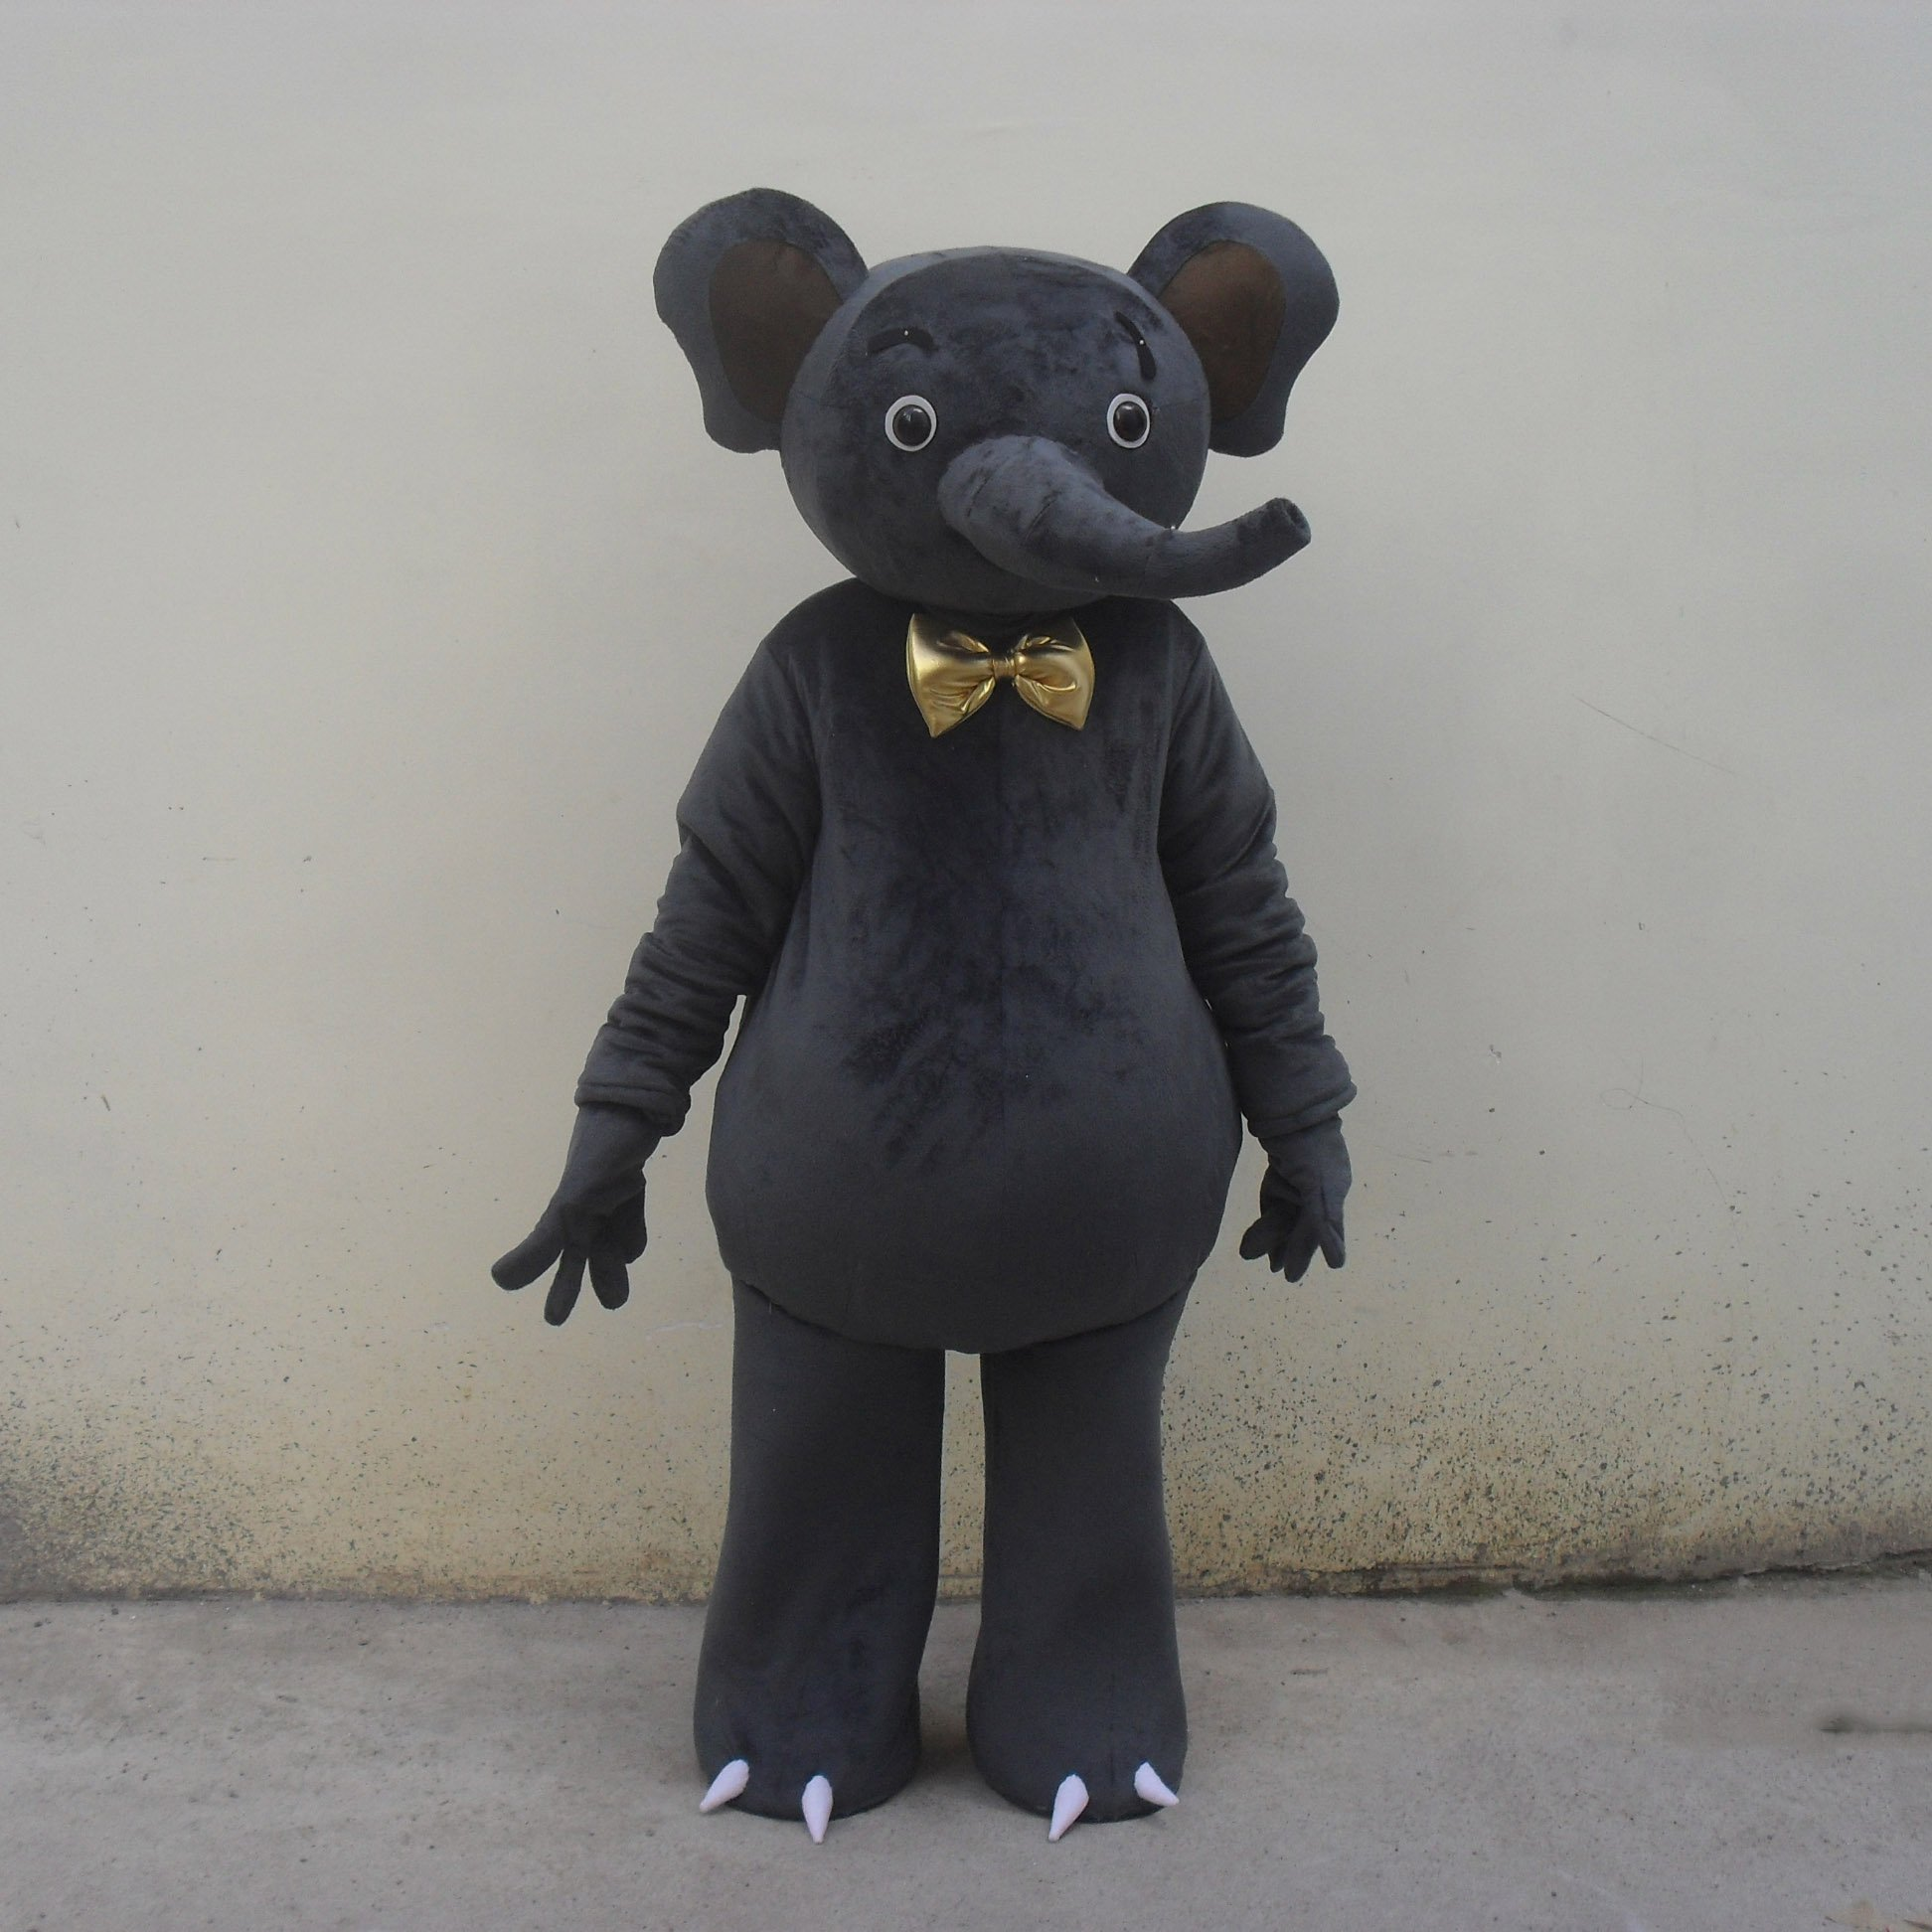 Cartoon Doll Clothing Cartoon Walking Doll Clothing Cartoon Show Clothing Doll Clothes Big Black Elephant Mascot Costume